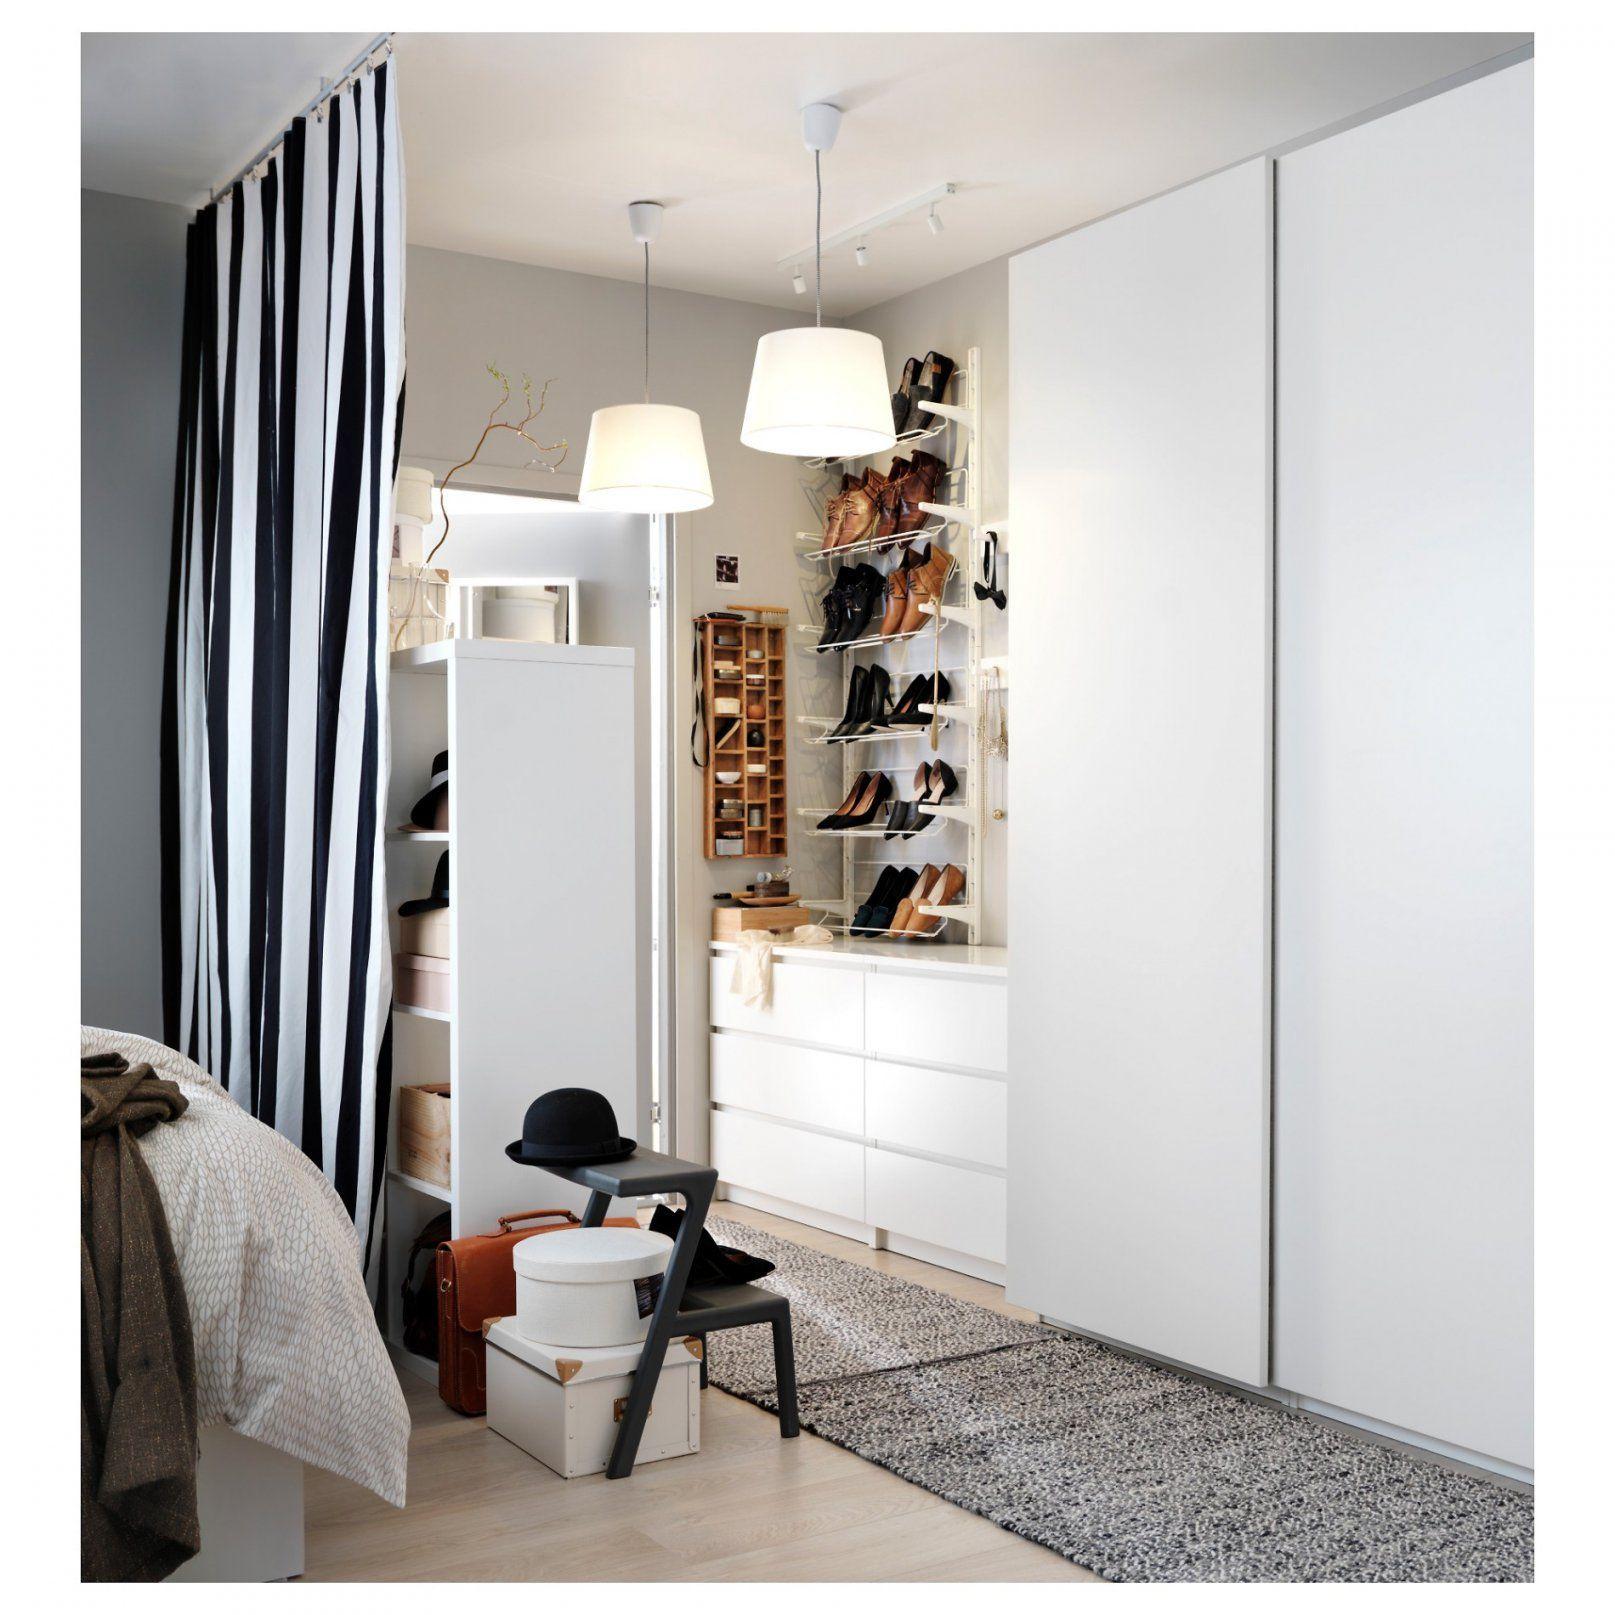 Neu Schrank Raumteiler | Raumteiler, Raumteiler ikea